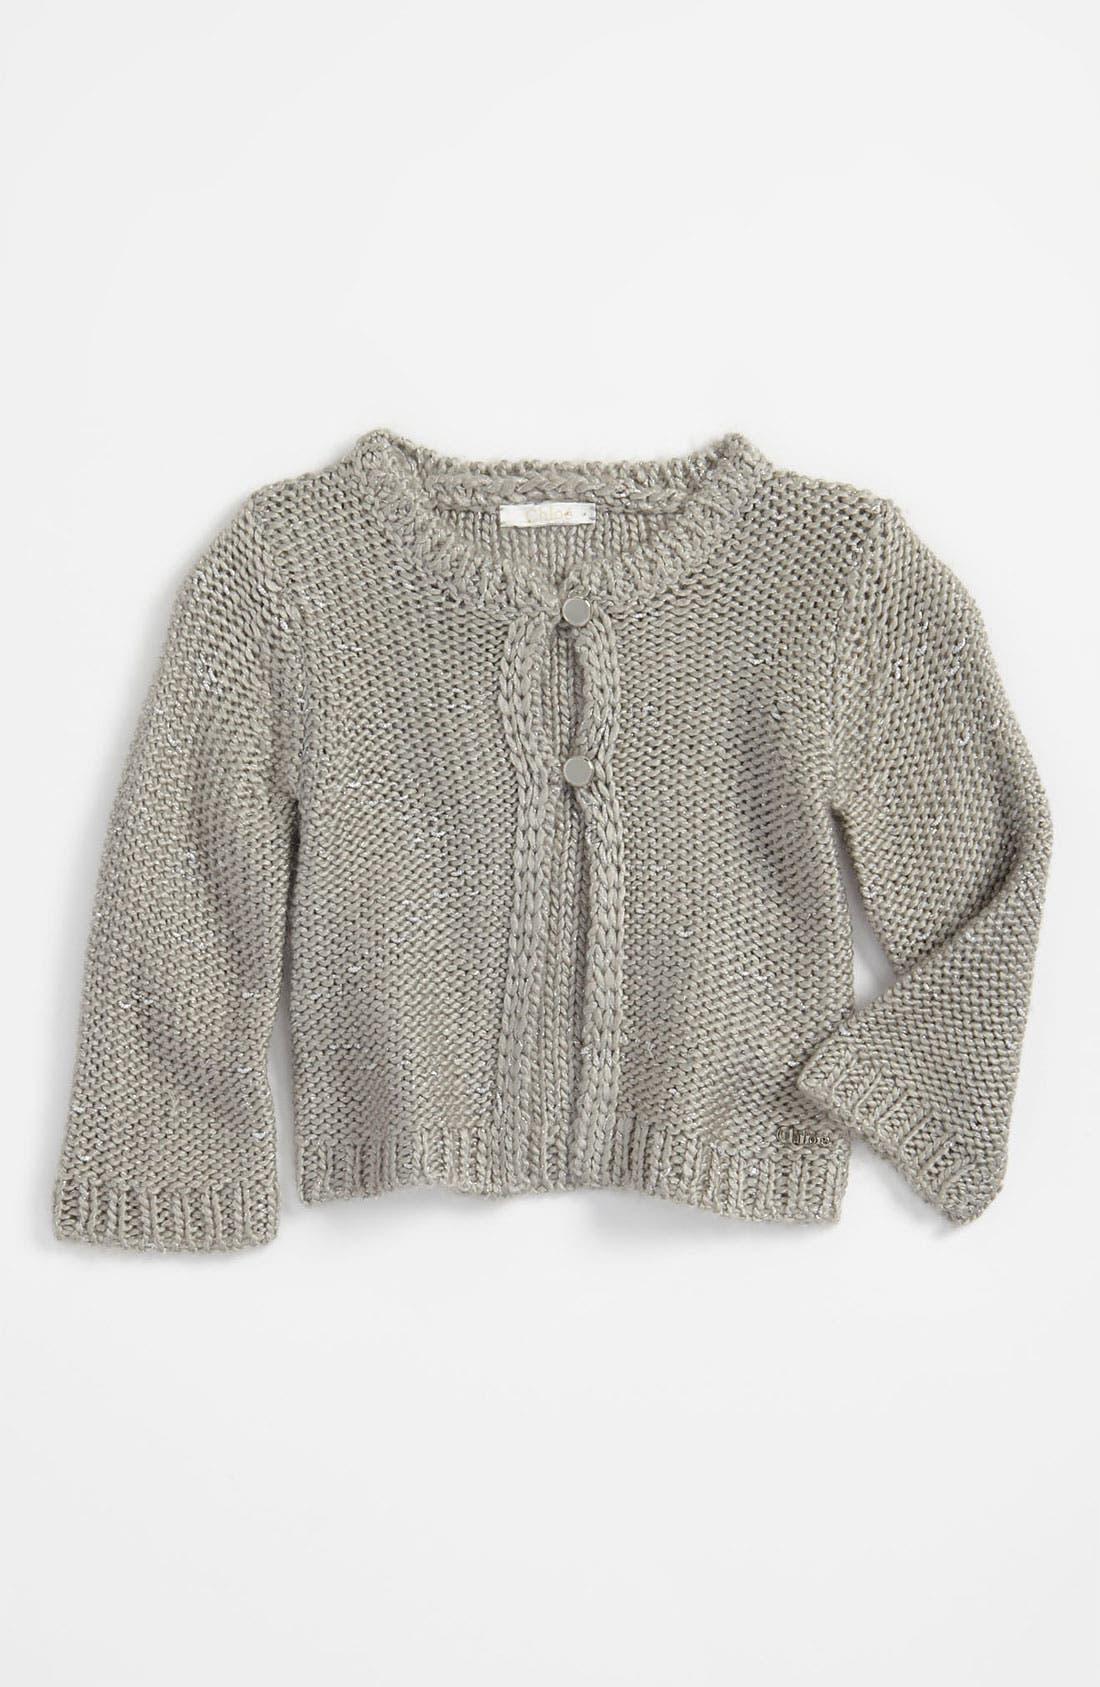 Alternate Image 1 Selected - Chloé Metallic Knit Cardigan (Infant)